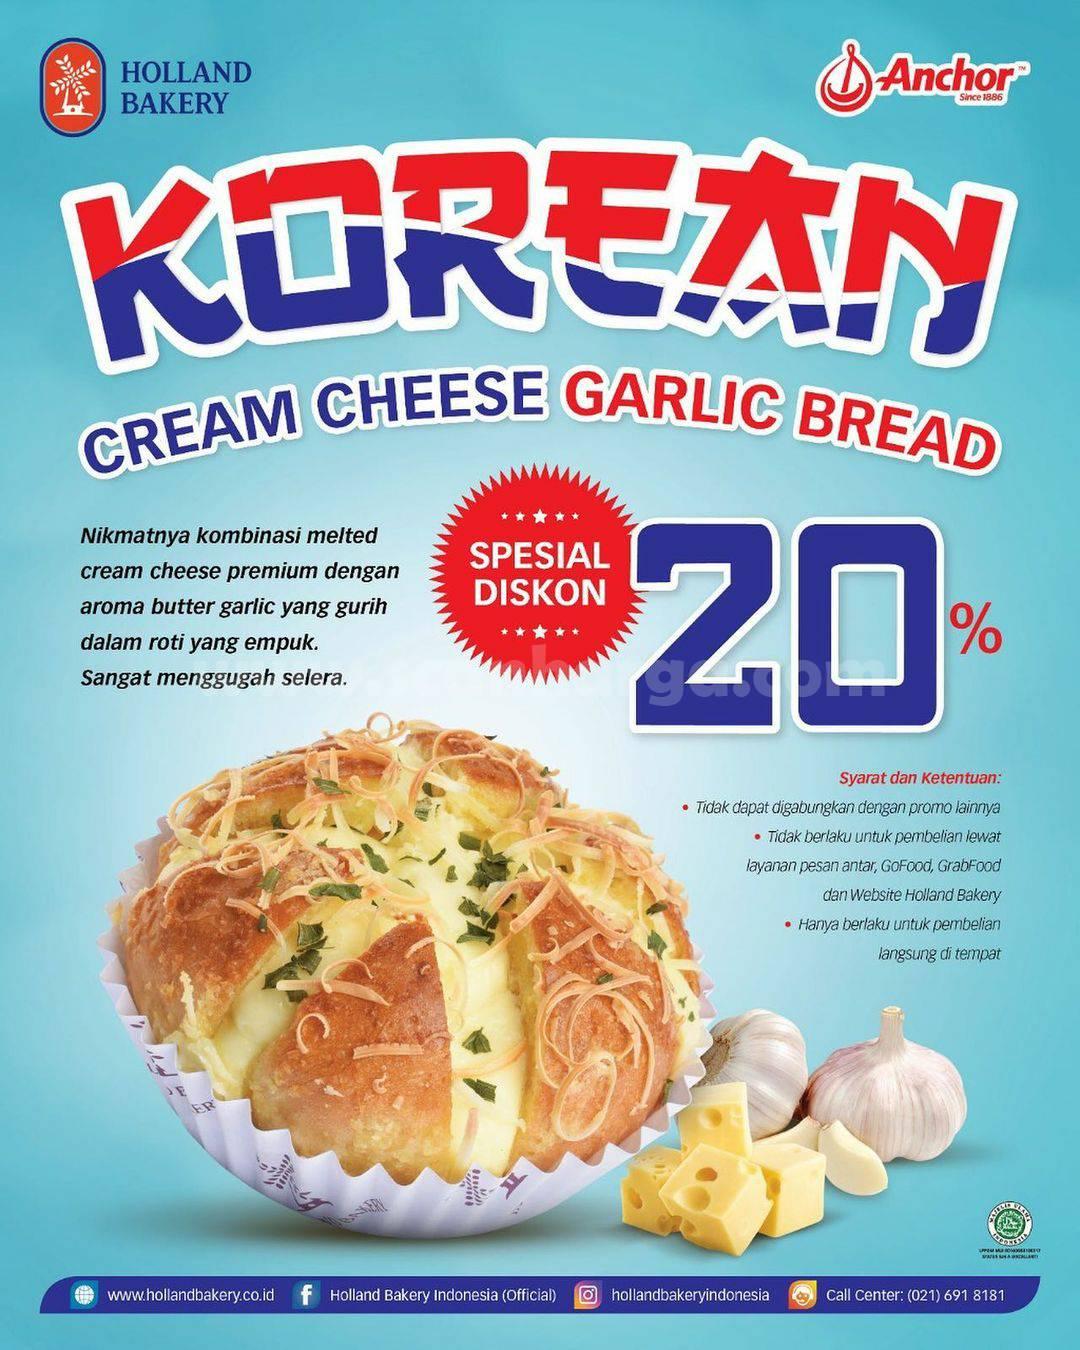 Holland Bakery Promo Harga Spesial untuk Korean Cheese Garlic Bread Diskon 20%